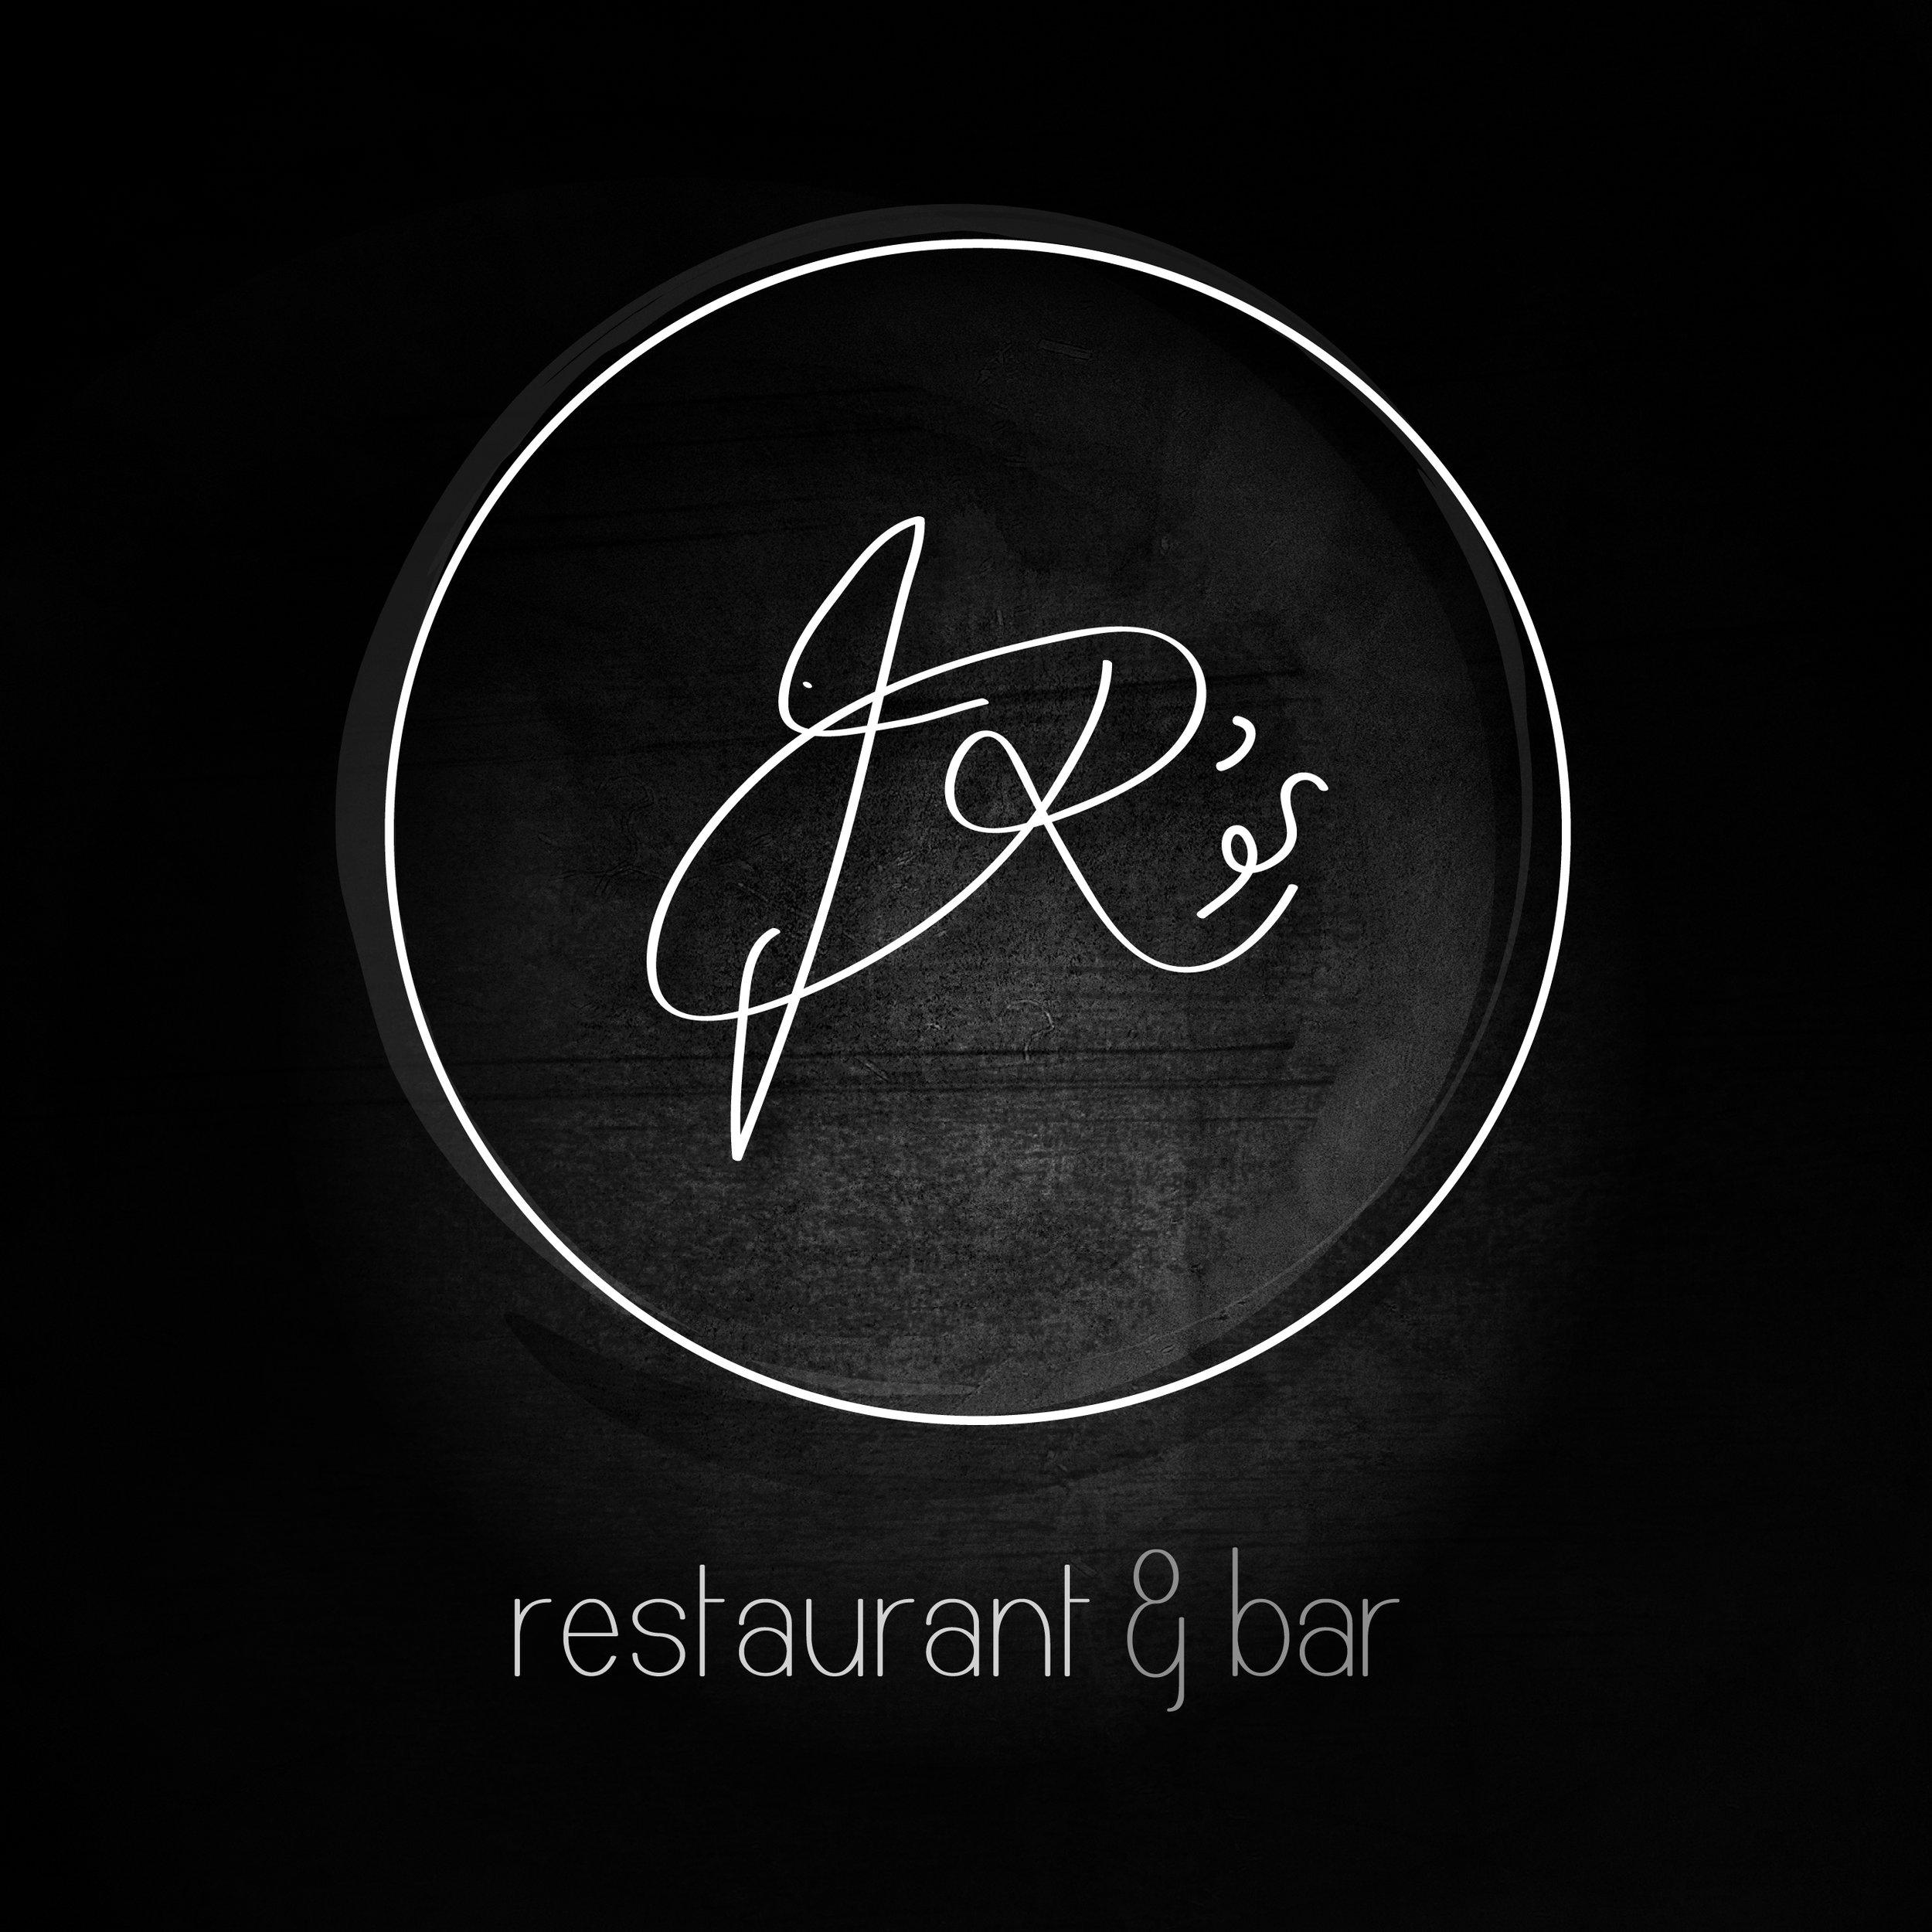 FINAL JRs logo design 040412 CJL-03.jpg